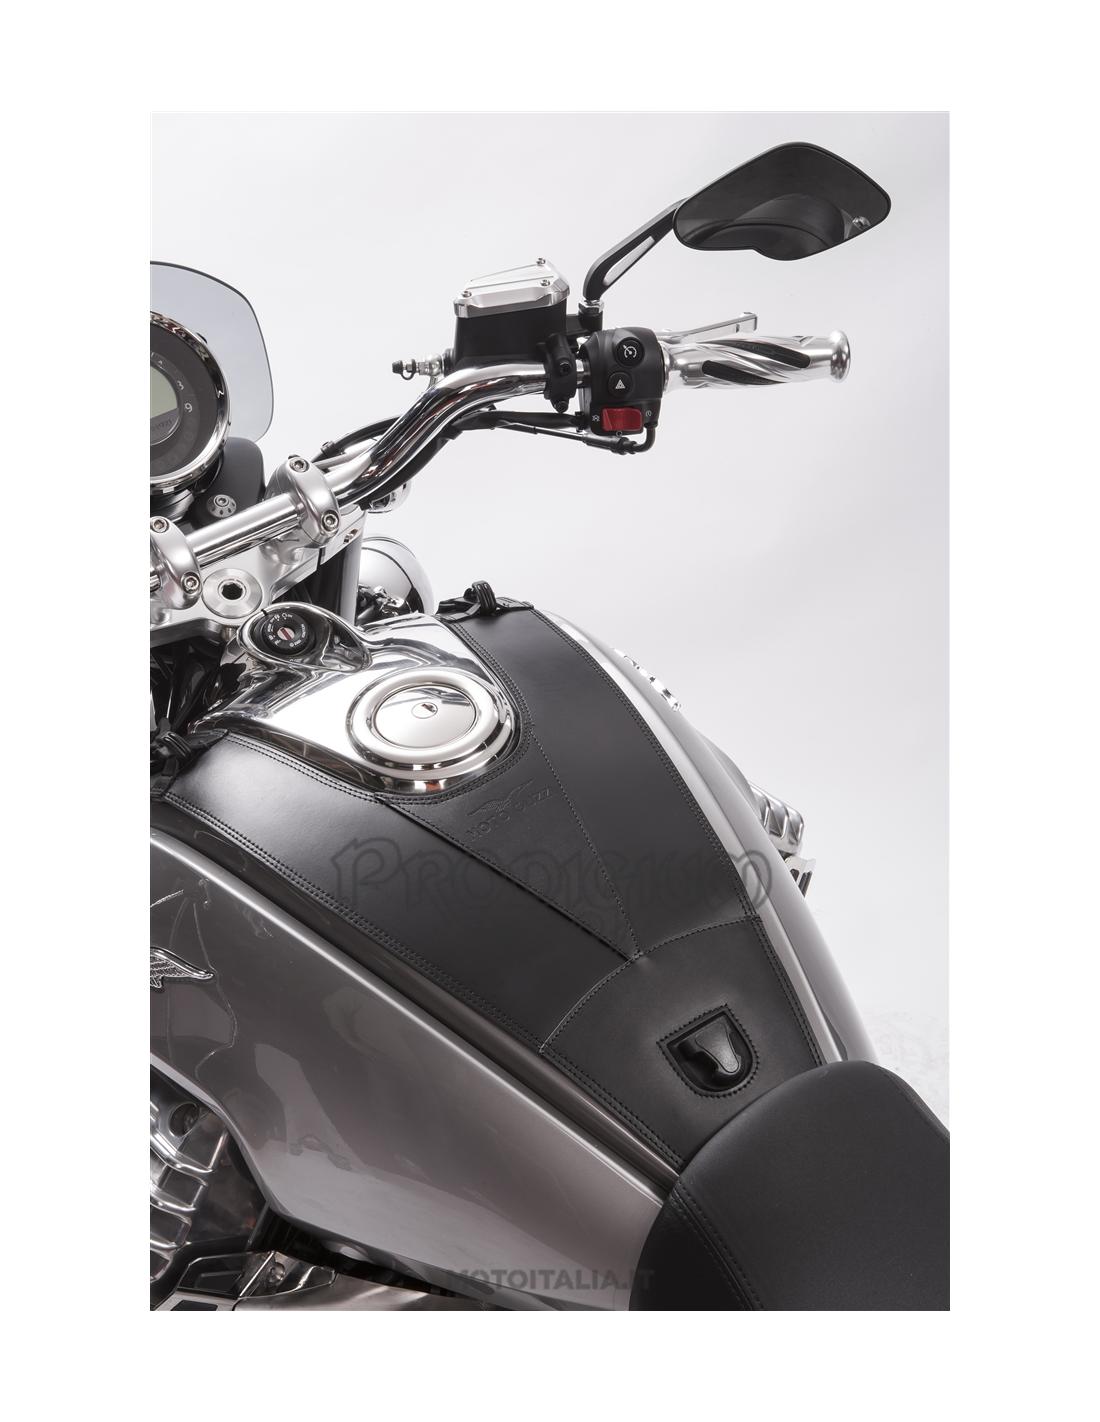 7ac9c2bbea fascia per borsa serbatoio in pelle california 1400 moto guzzi - 2s fascia  per borsa serbatoio in pelle california 1400 moto guzzi ...